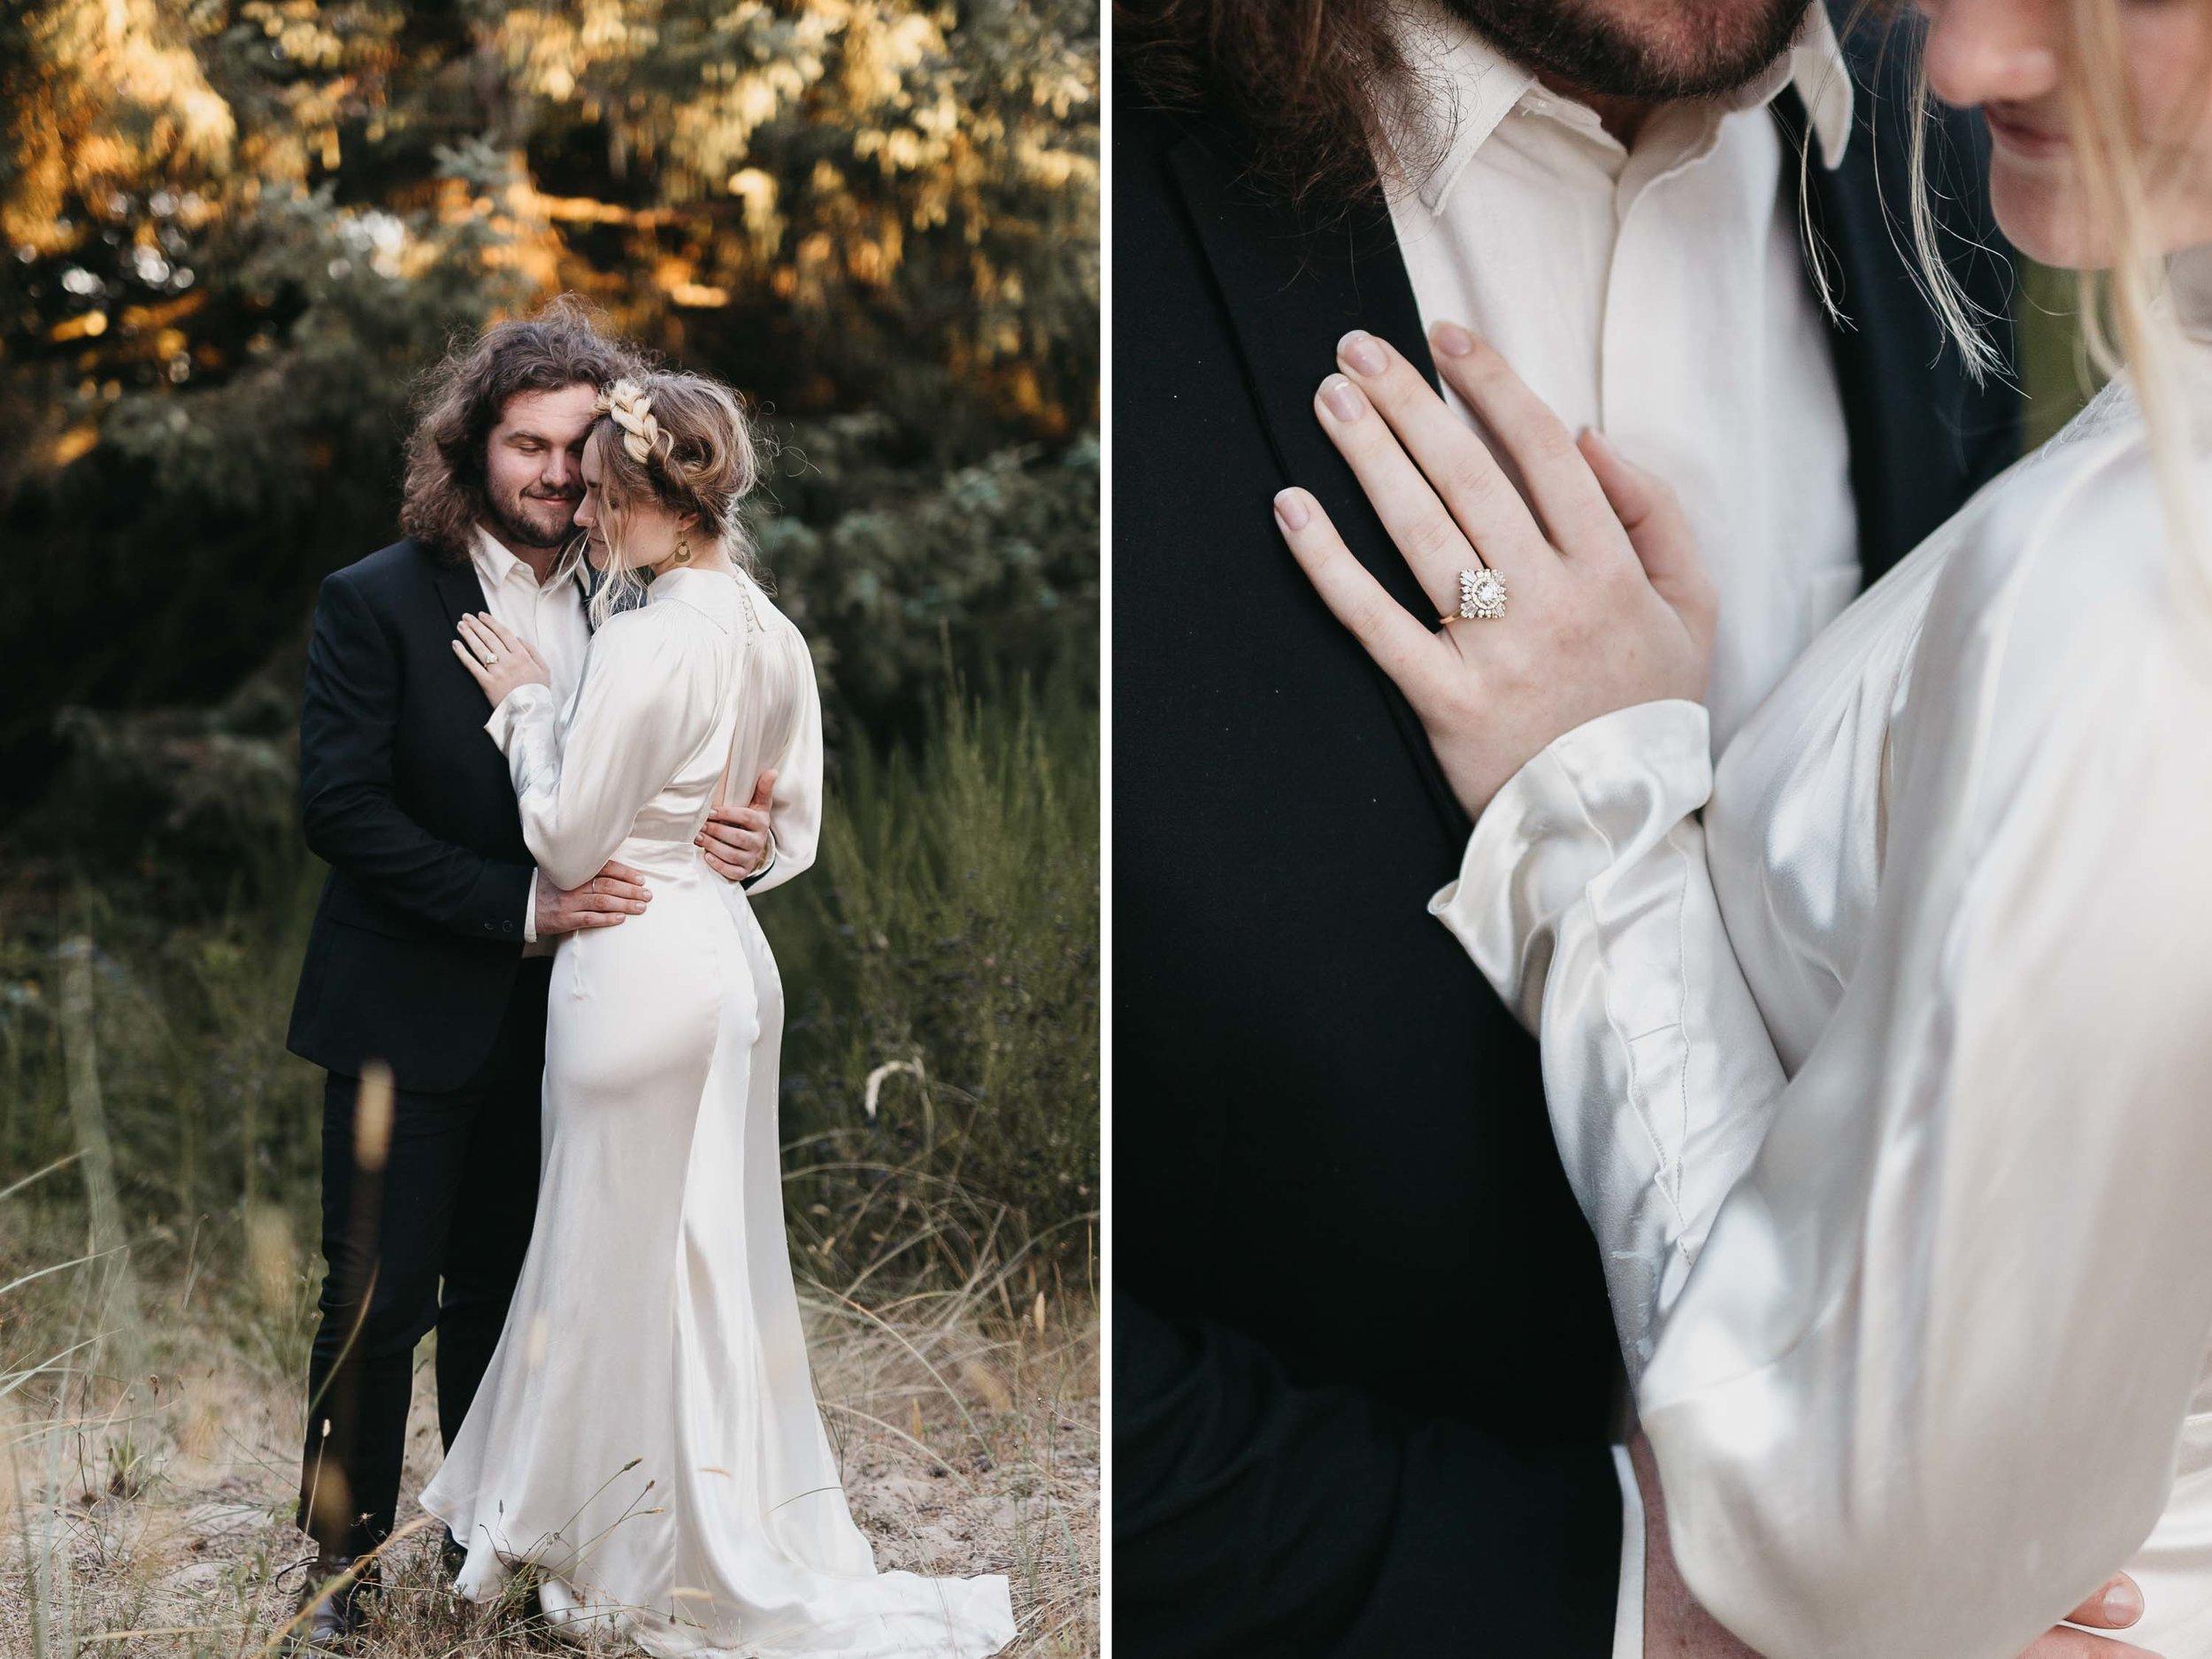 Oregon-Wedding-Photographer-02.jpg